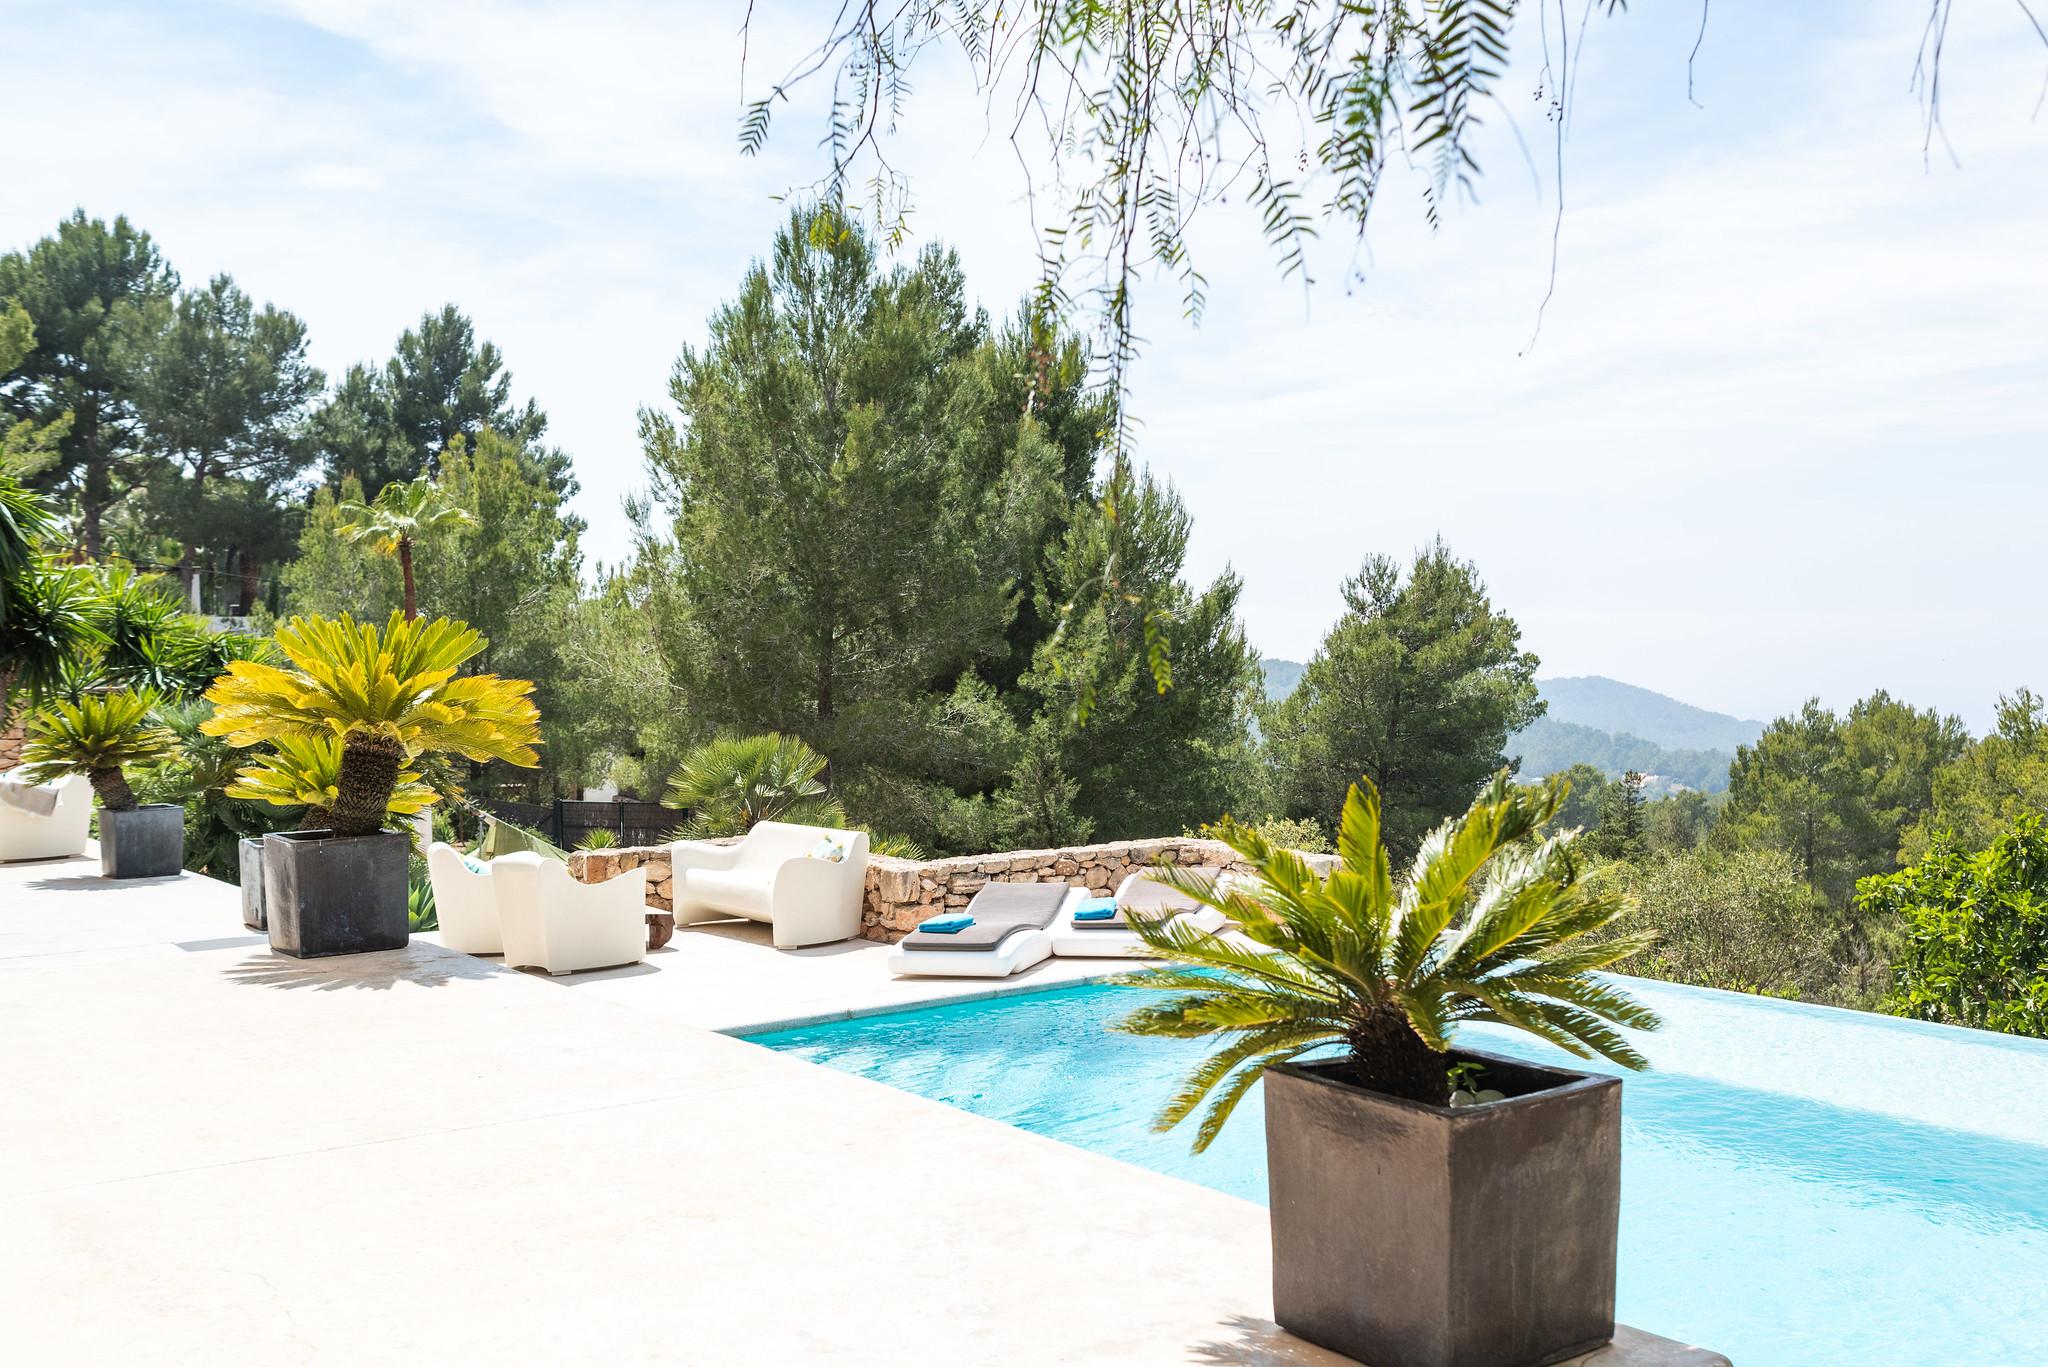 https://www.white-ibiza.com/wp-content/uploads/2020/06/white-ibiza-villas-villa-azul-exterior-pool2.jpg